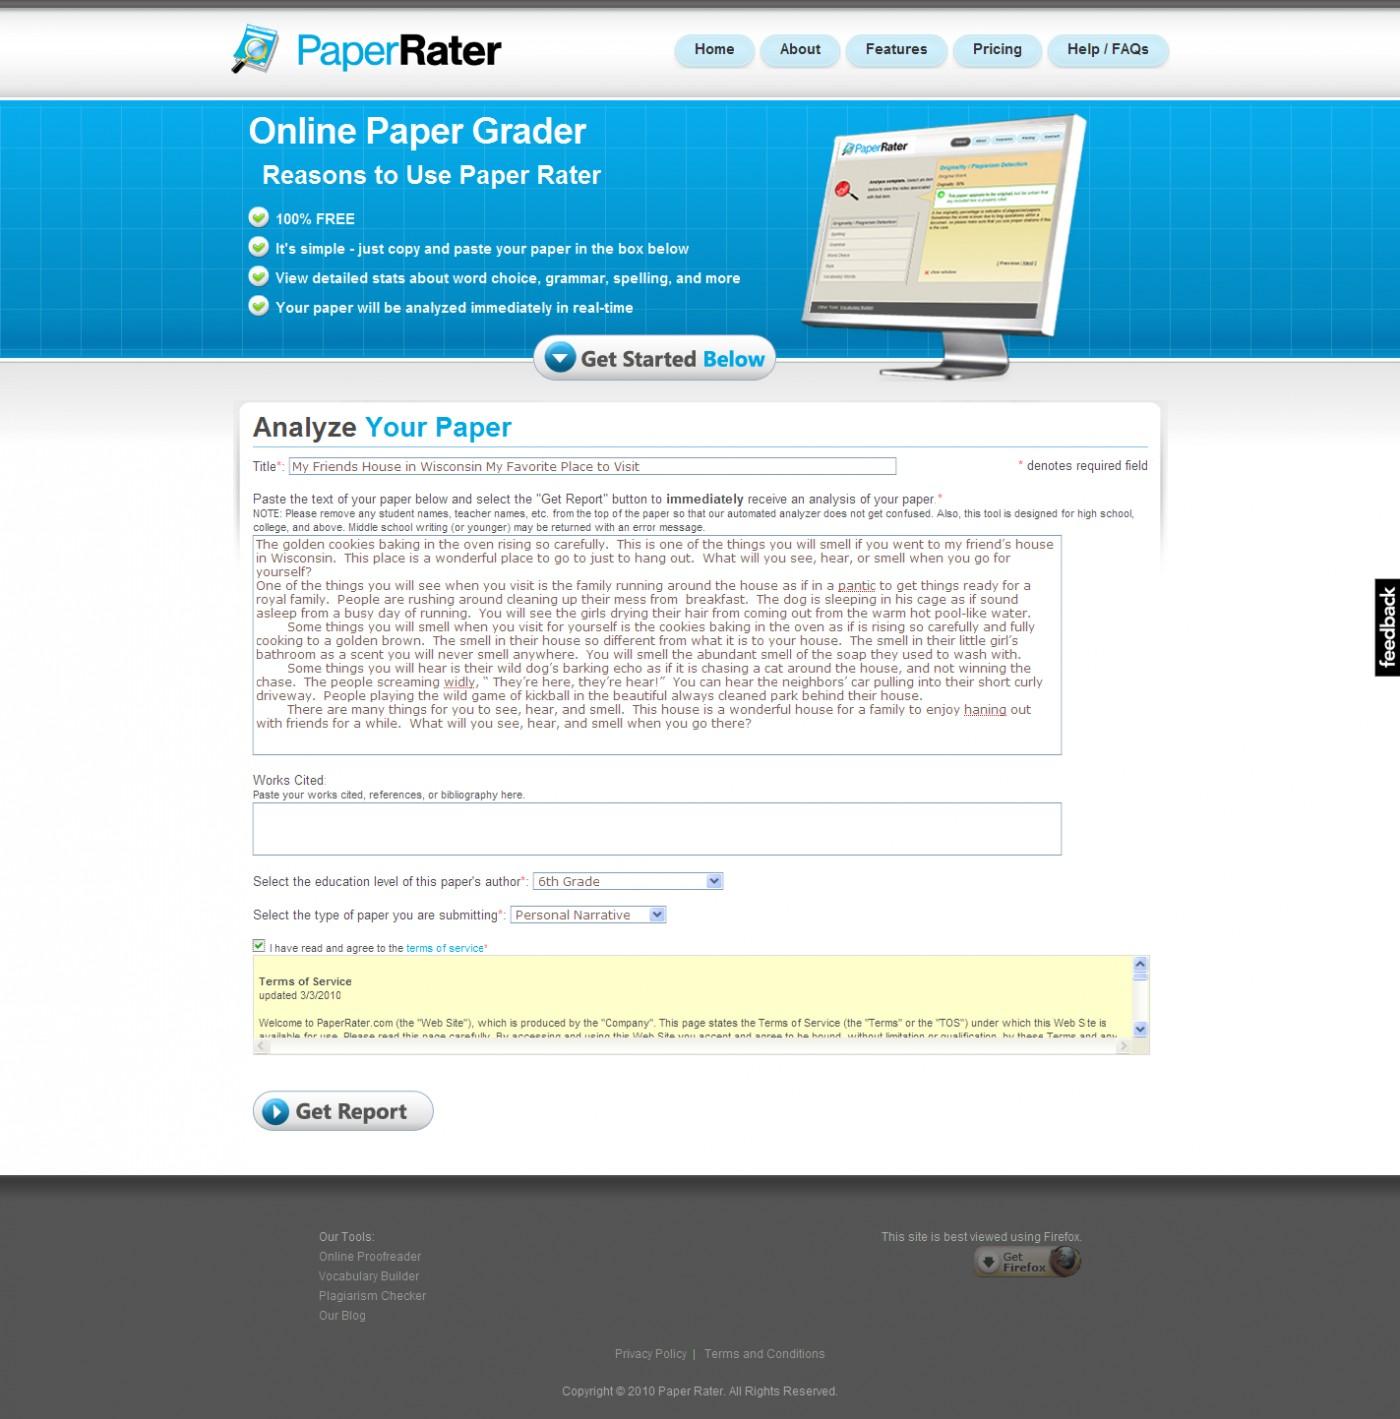 007 Essay Checker Free Online Example Amazing Sentence Grammar Plagiarism Document 1400